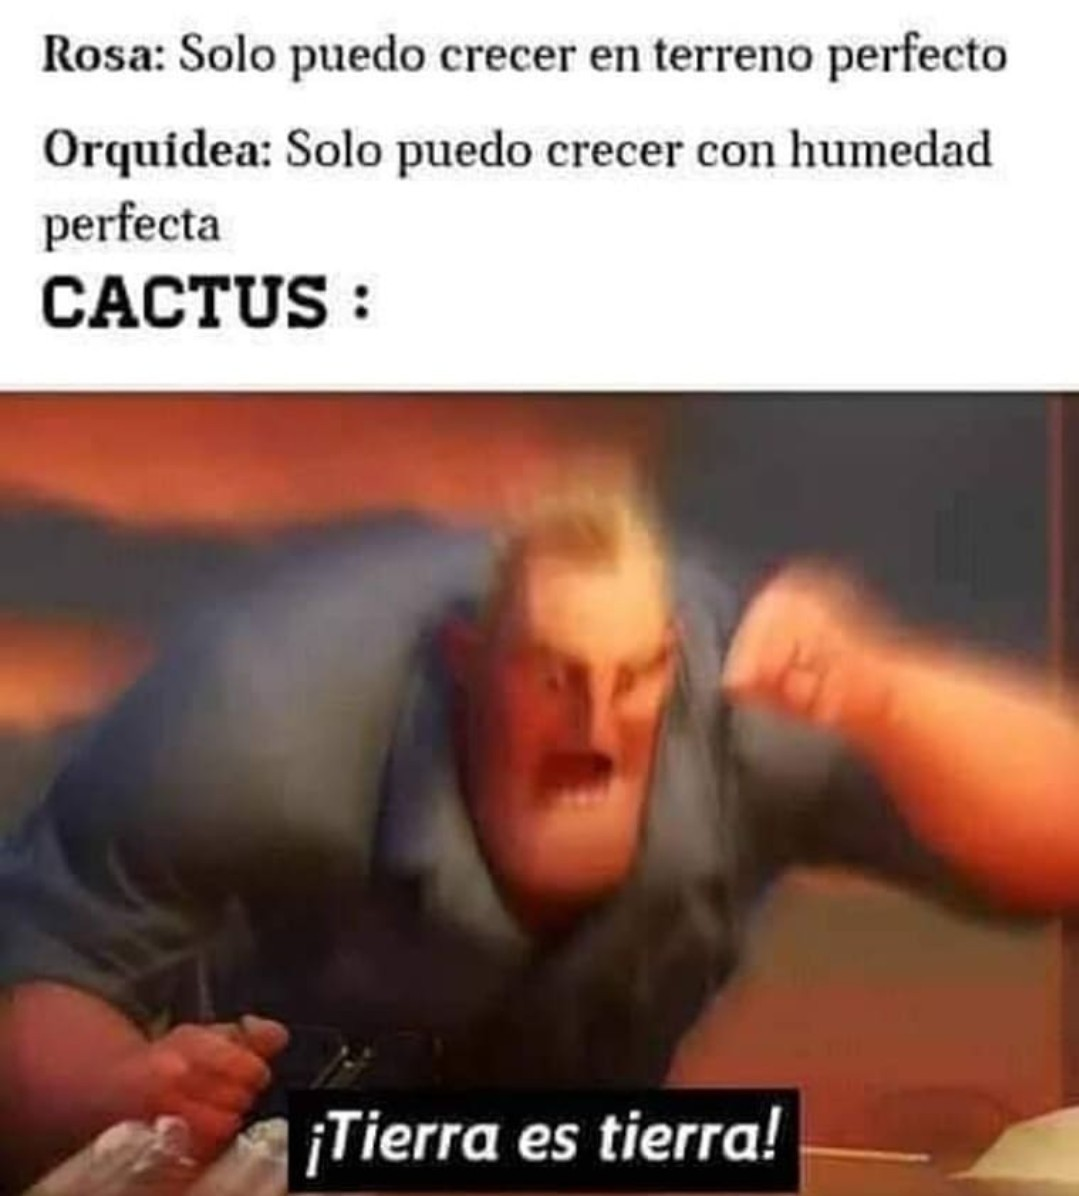 1 lokazo el caktus - meme